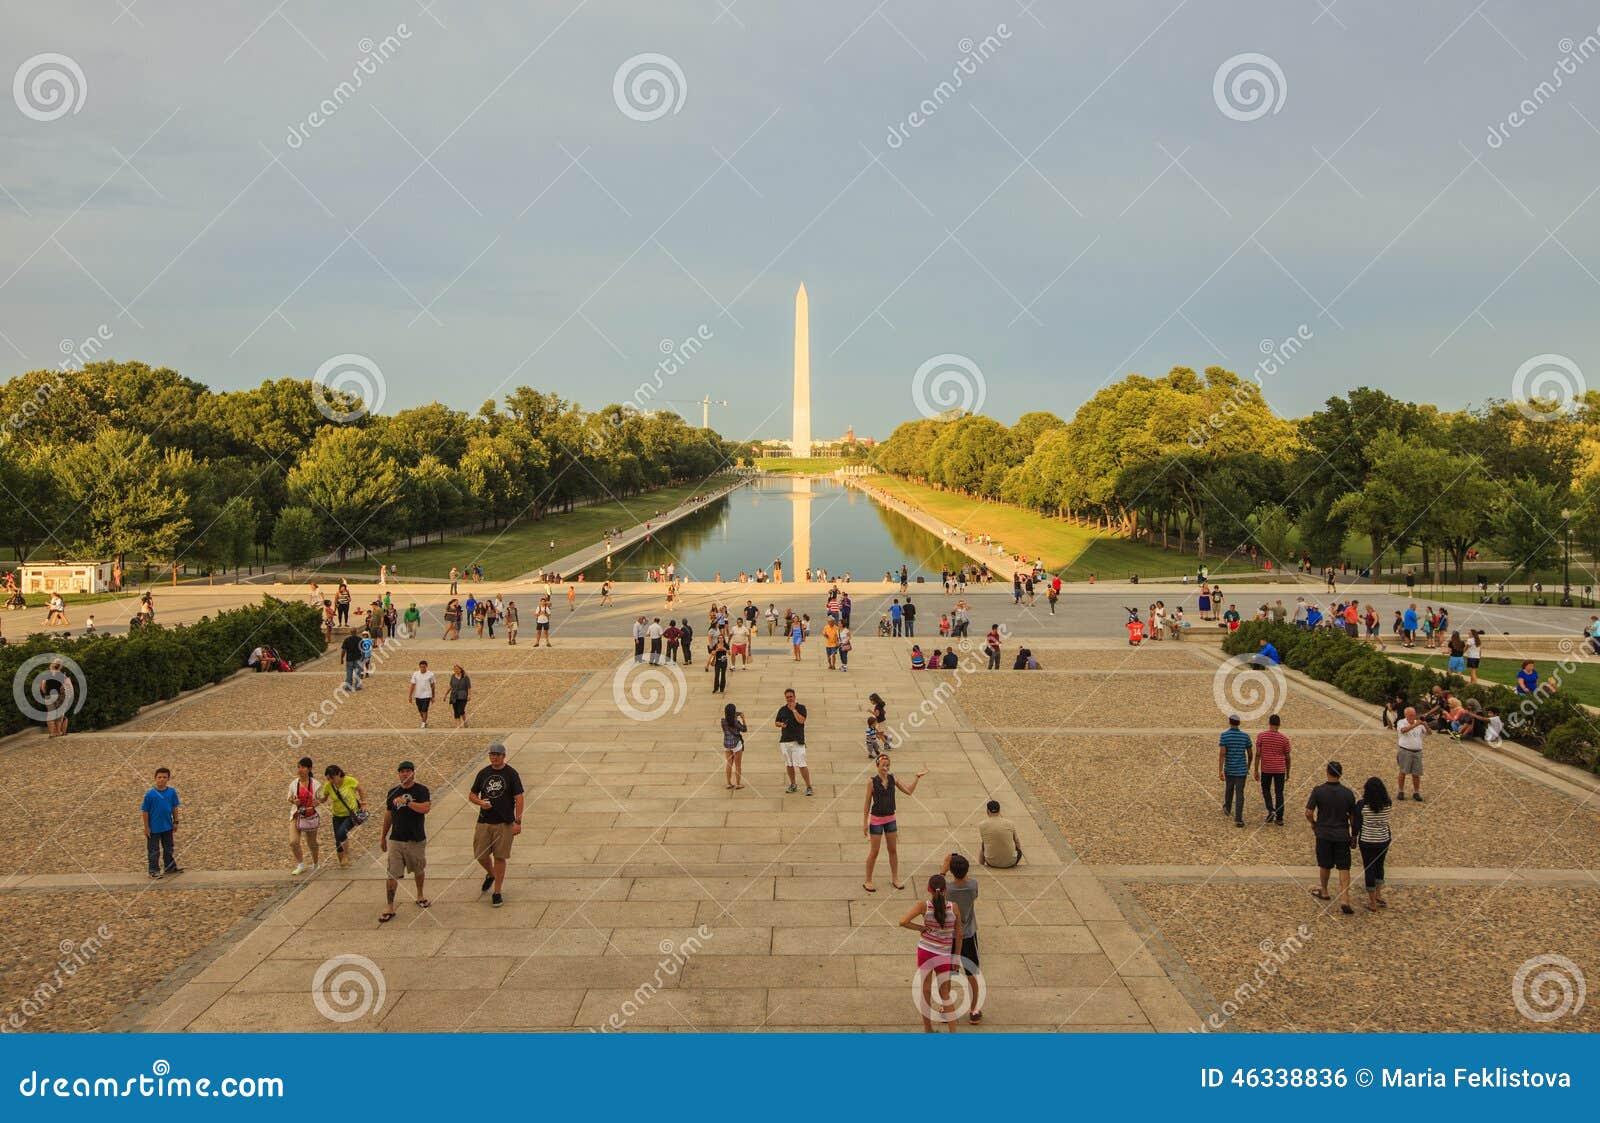 Sunset view to the National World War II Memorial in Washington DC